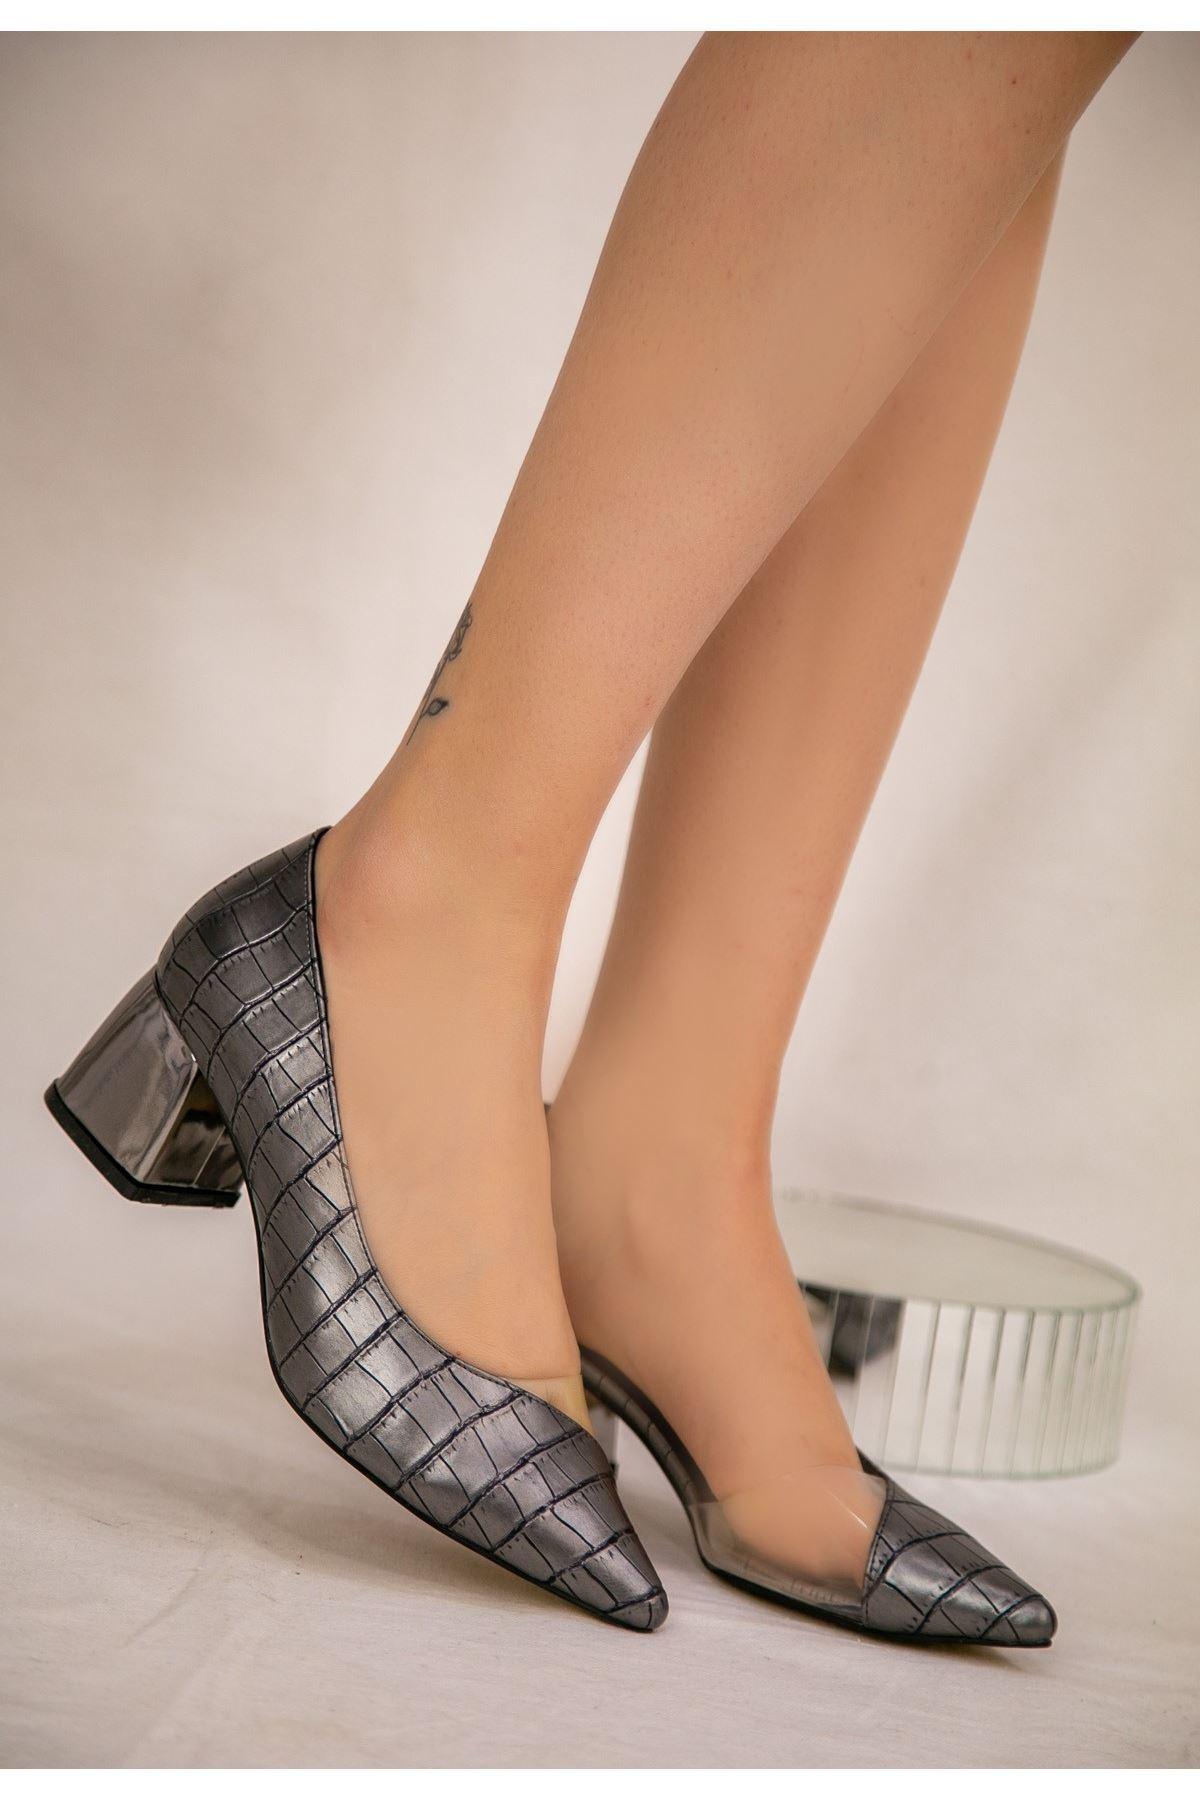 Tica Platin Cilt Desenli Topuklu Ayakkabı